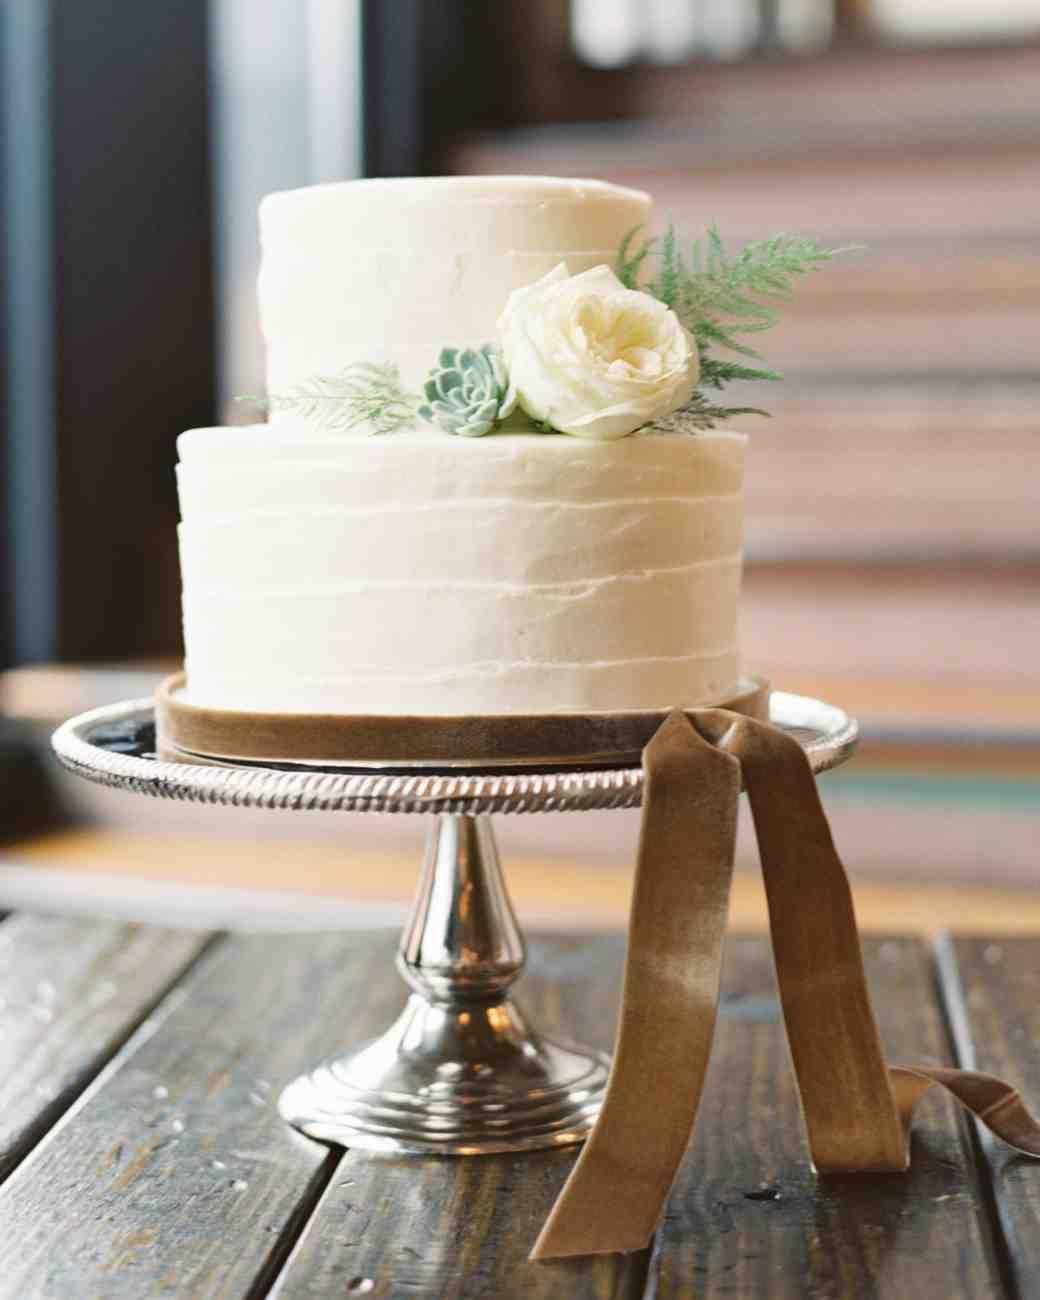 Wedding Cupcake Tier Ideas: Our Favorite Winter Wedding Cakes